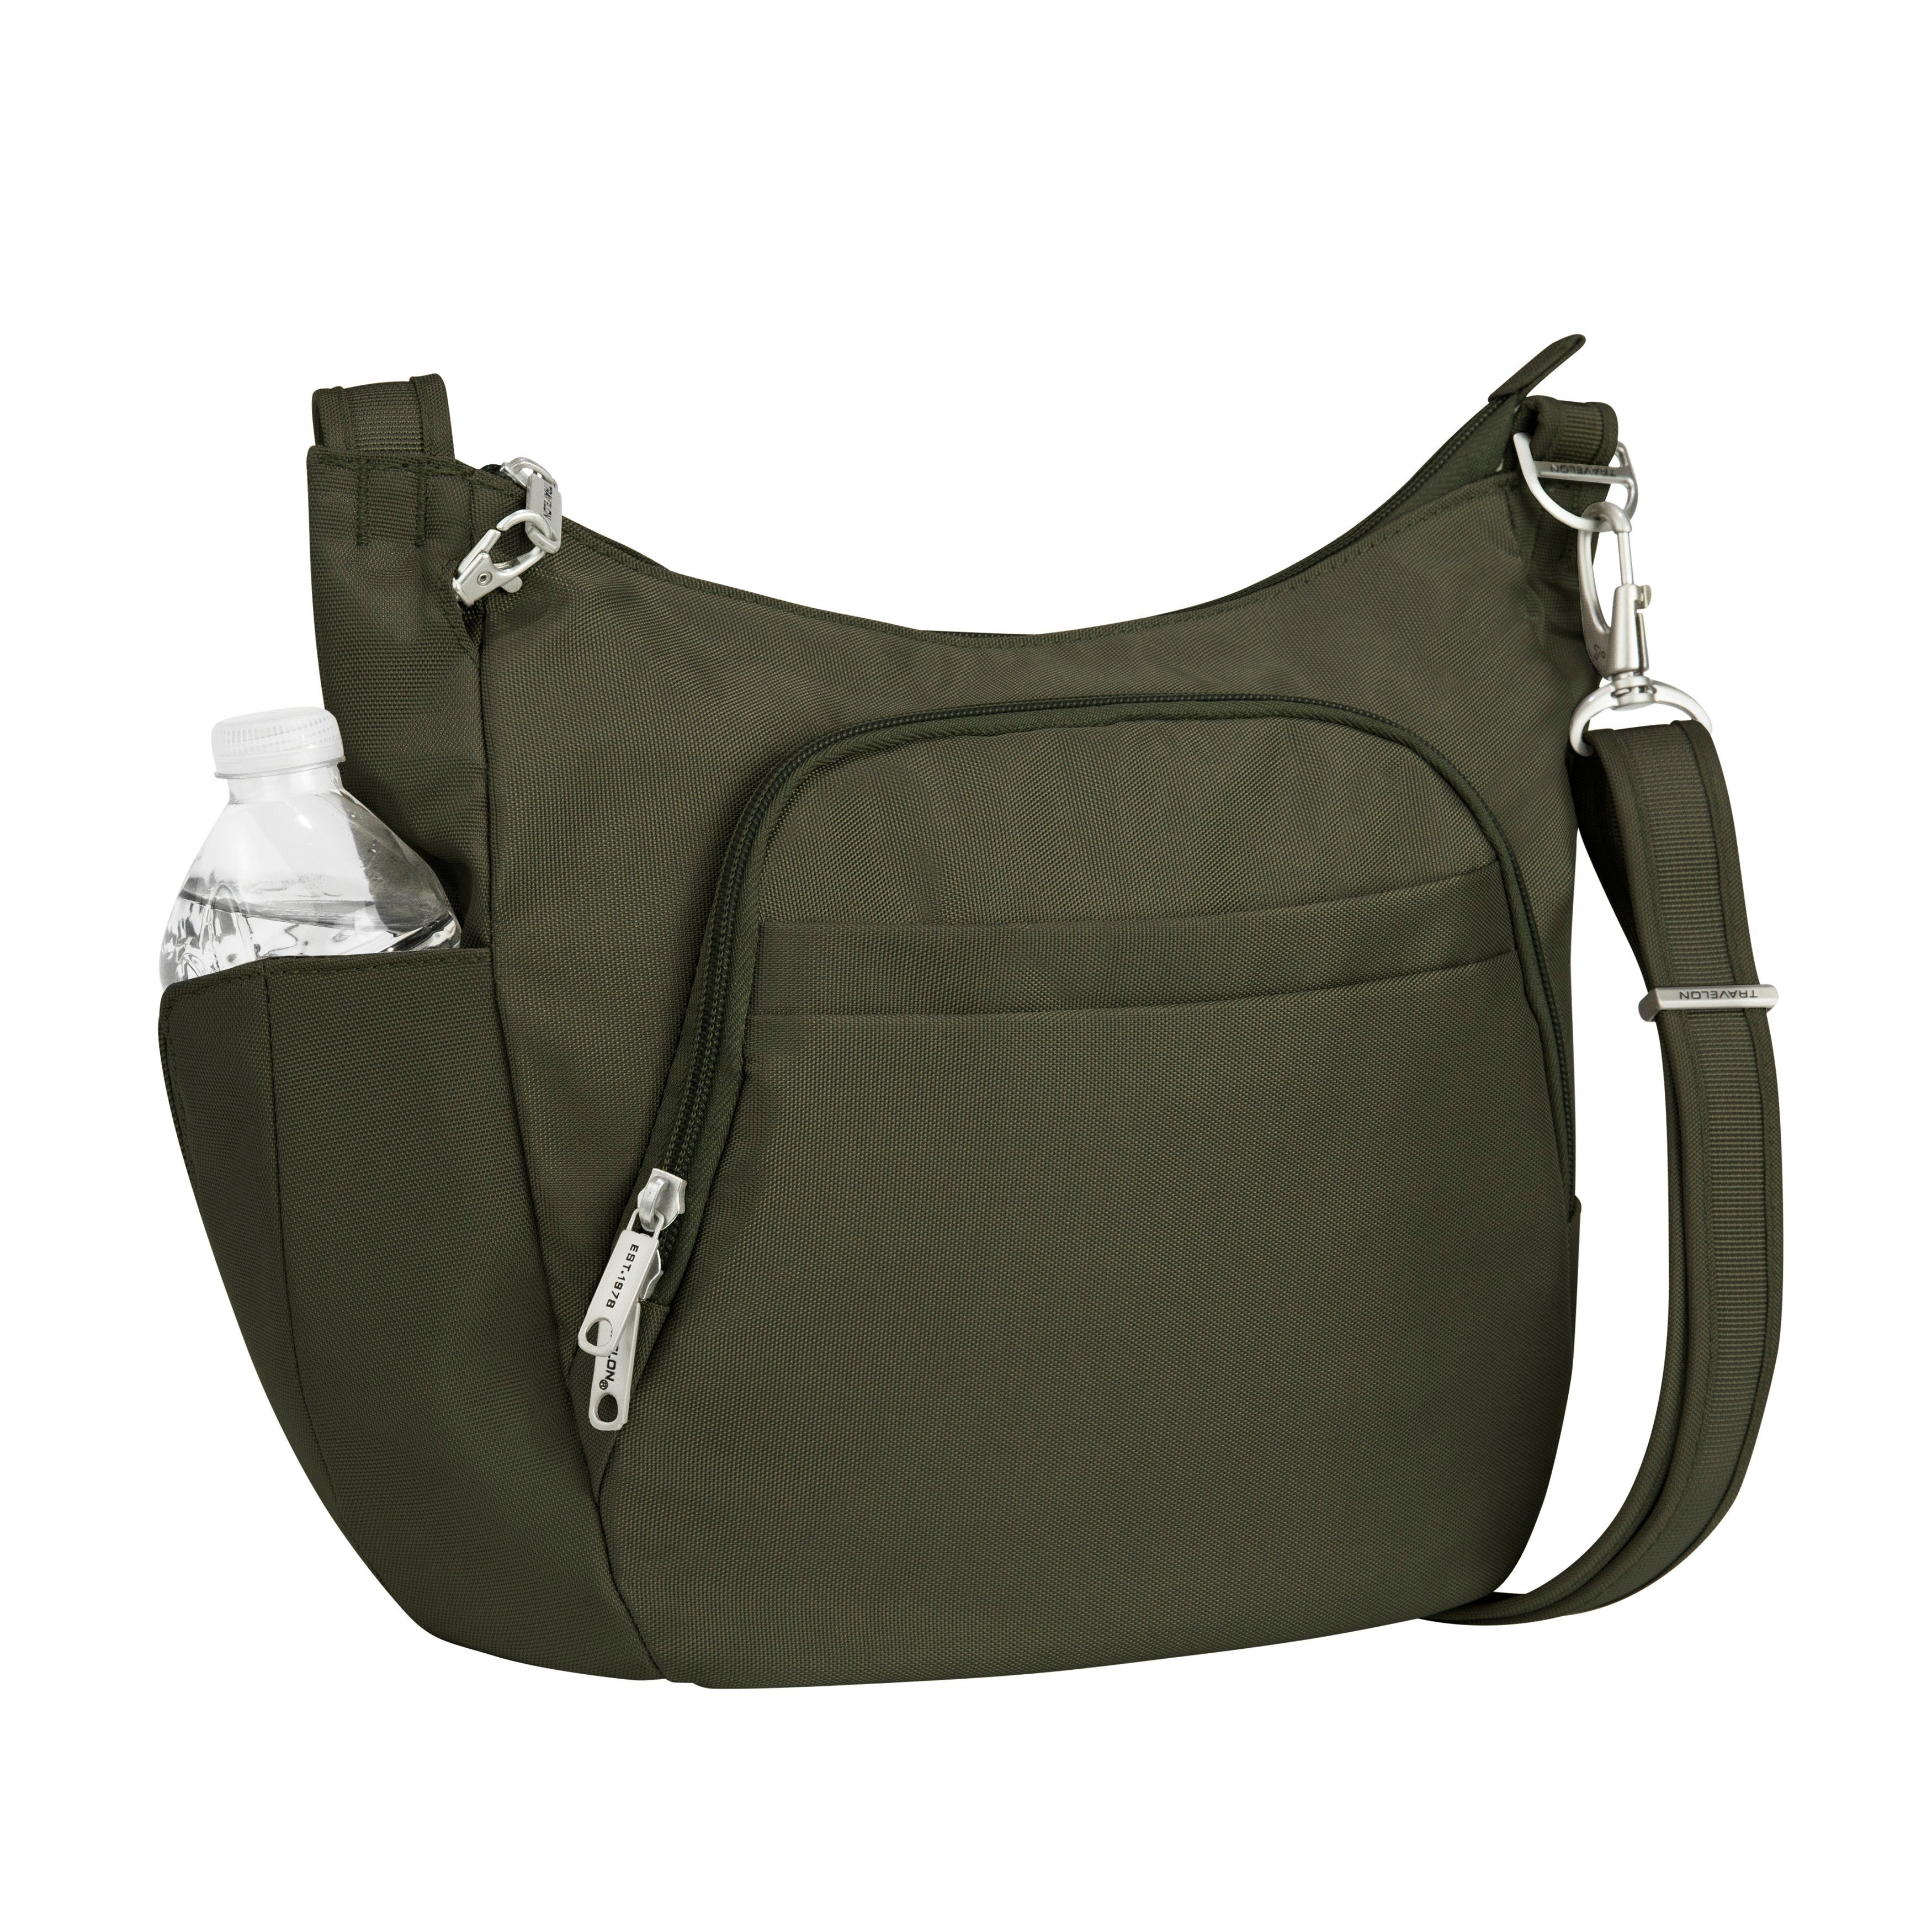 b1ee810e0b20 Shop Travelon Anti-theft Classic Cross-body Bucket Bag - Free ...